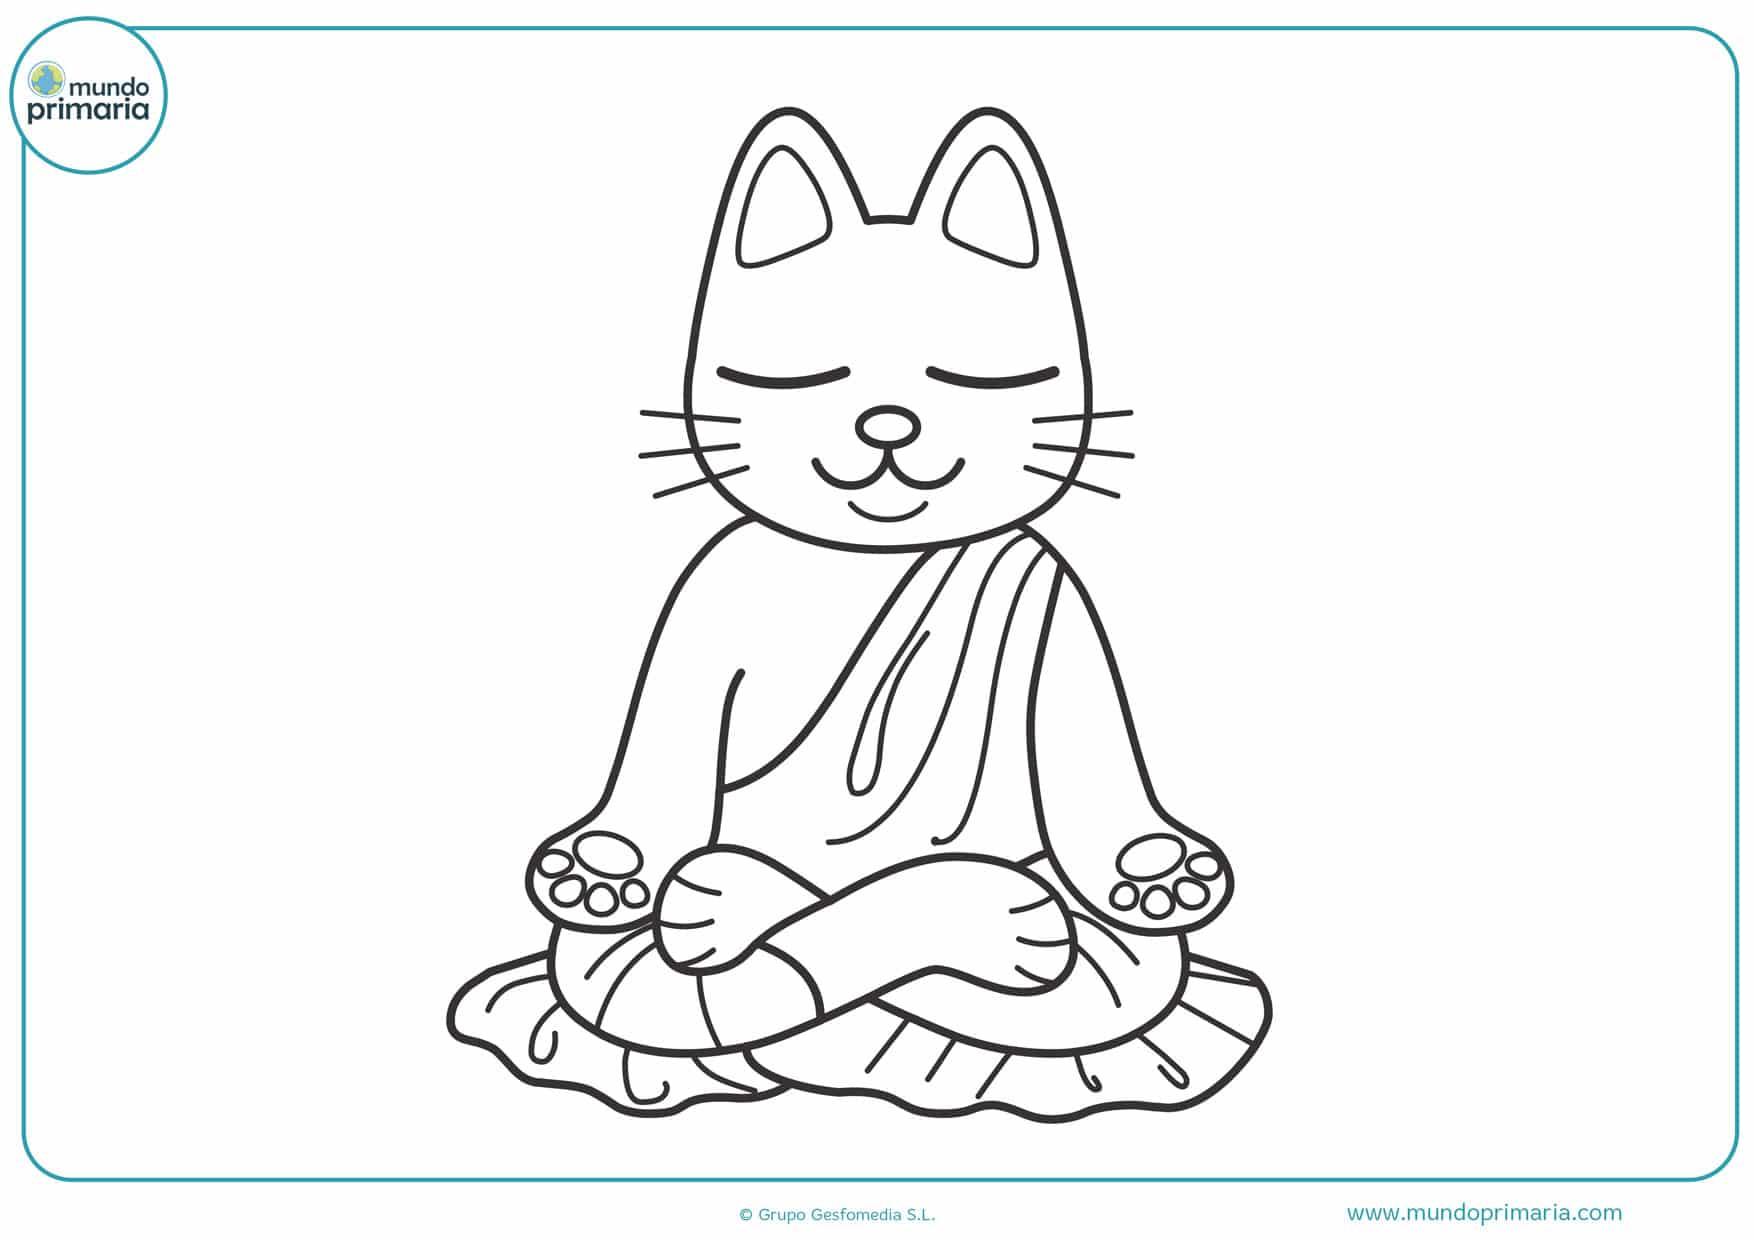 imágenes de gatos para colorear e imprimir